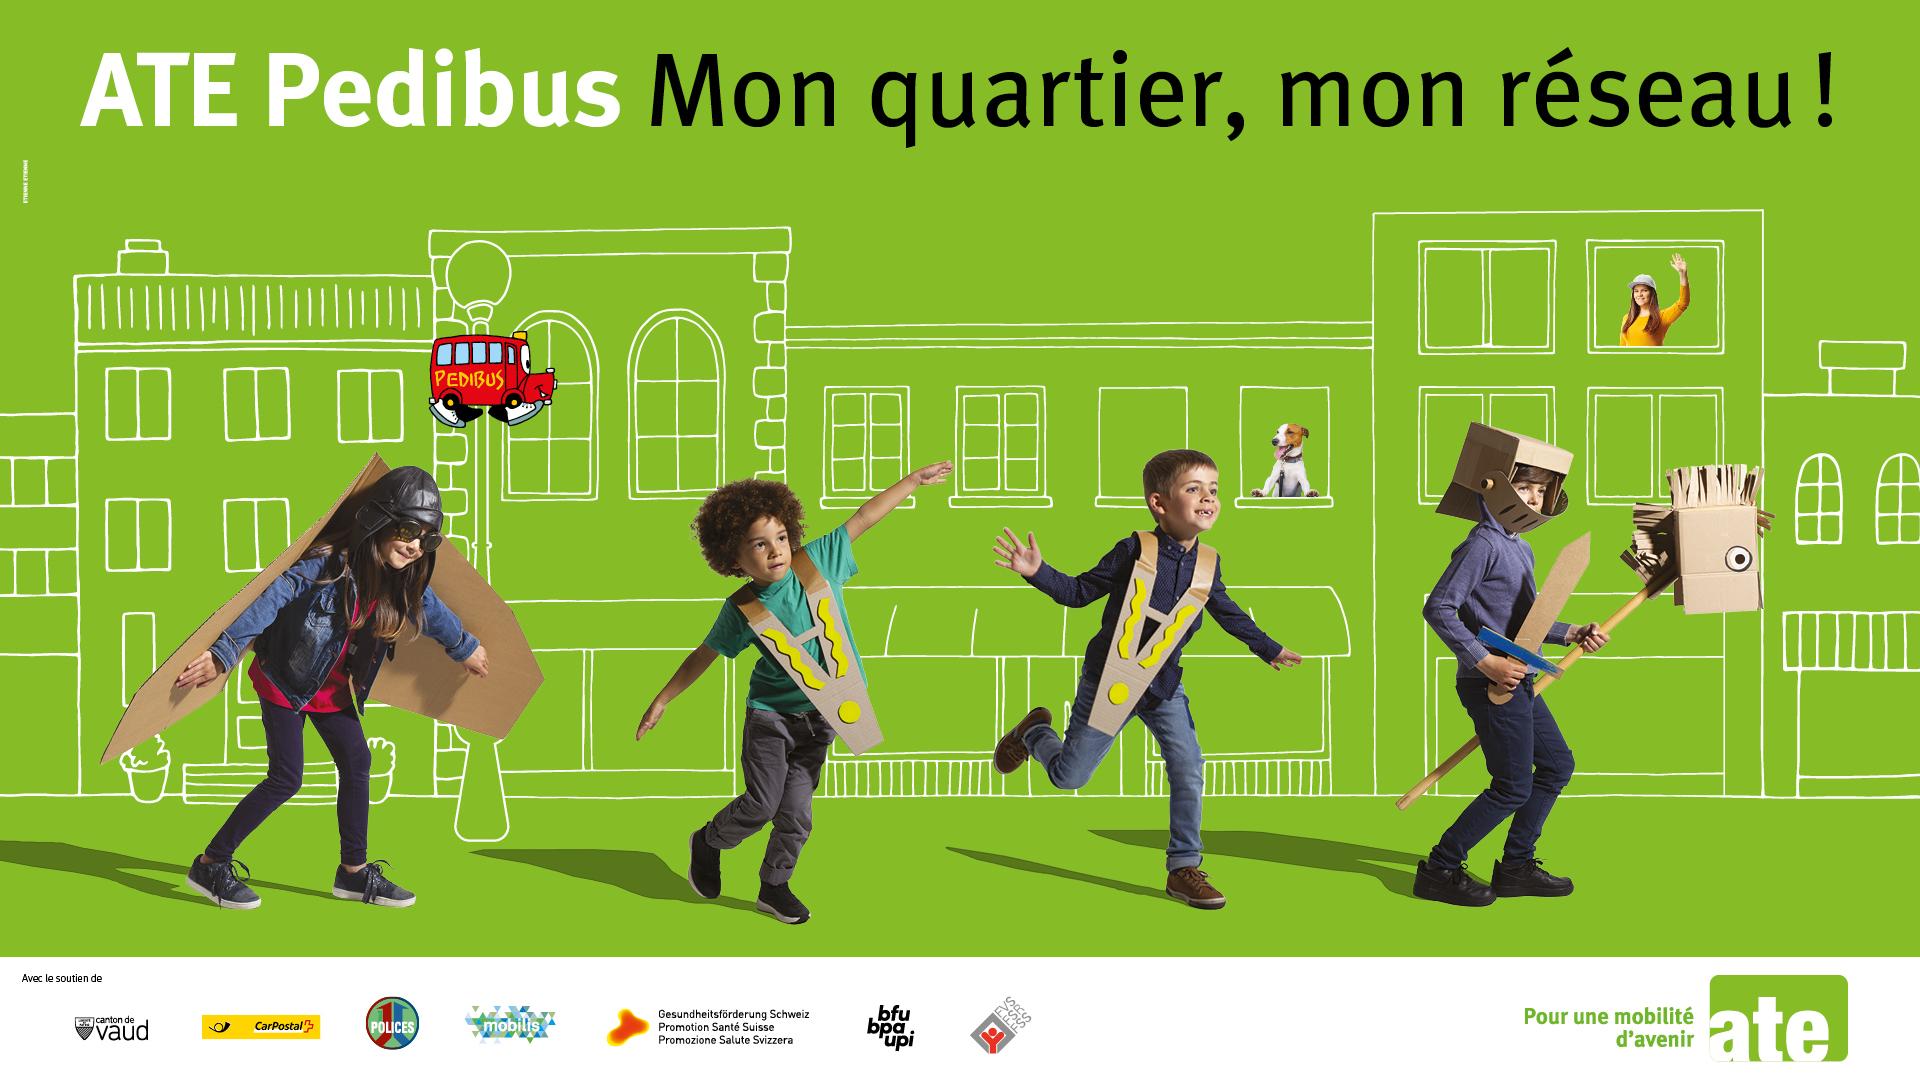 Partenariat Pedibus et transports publics